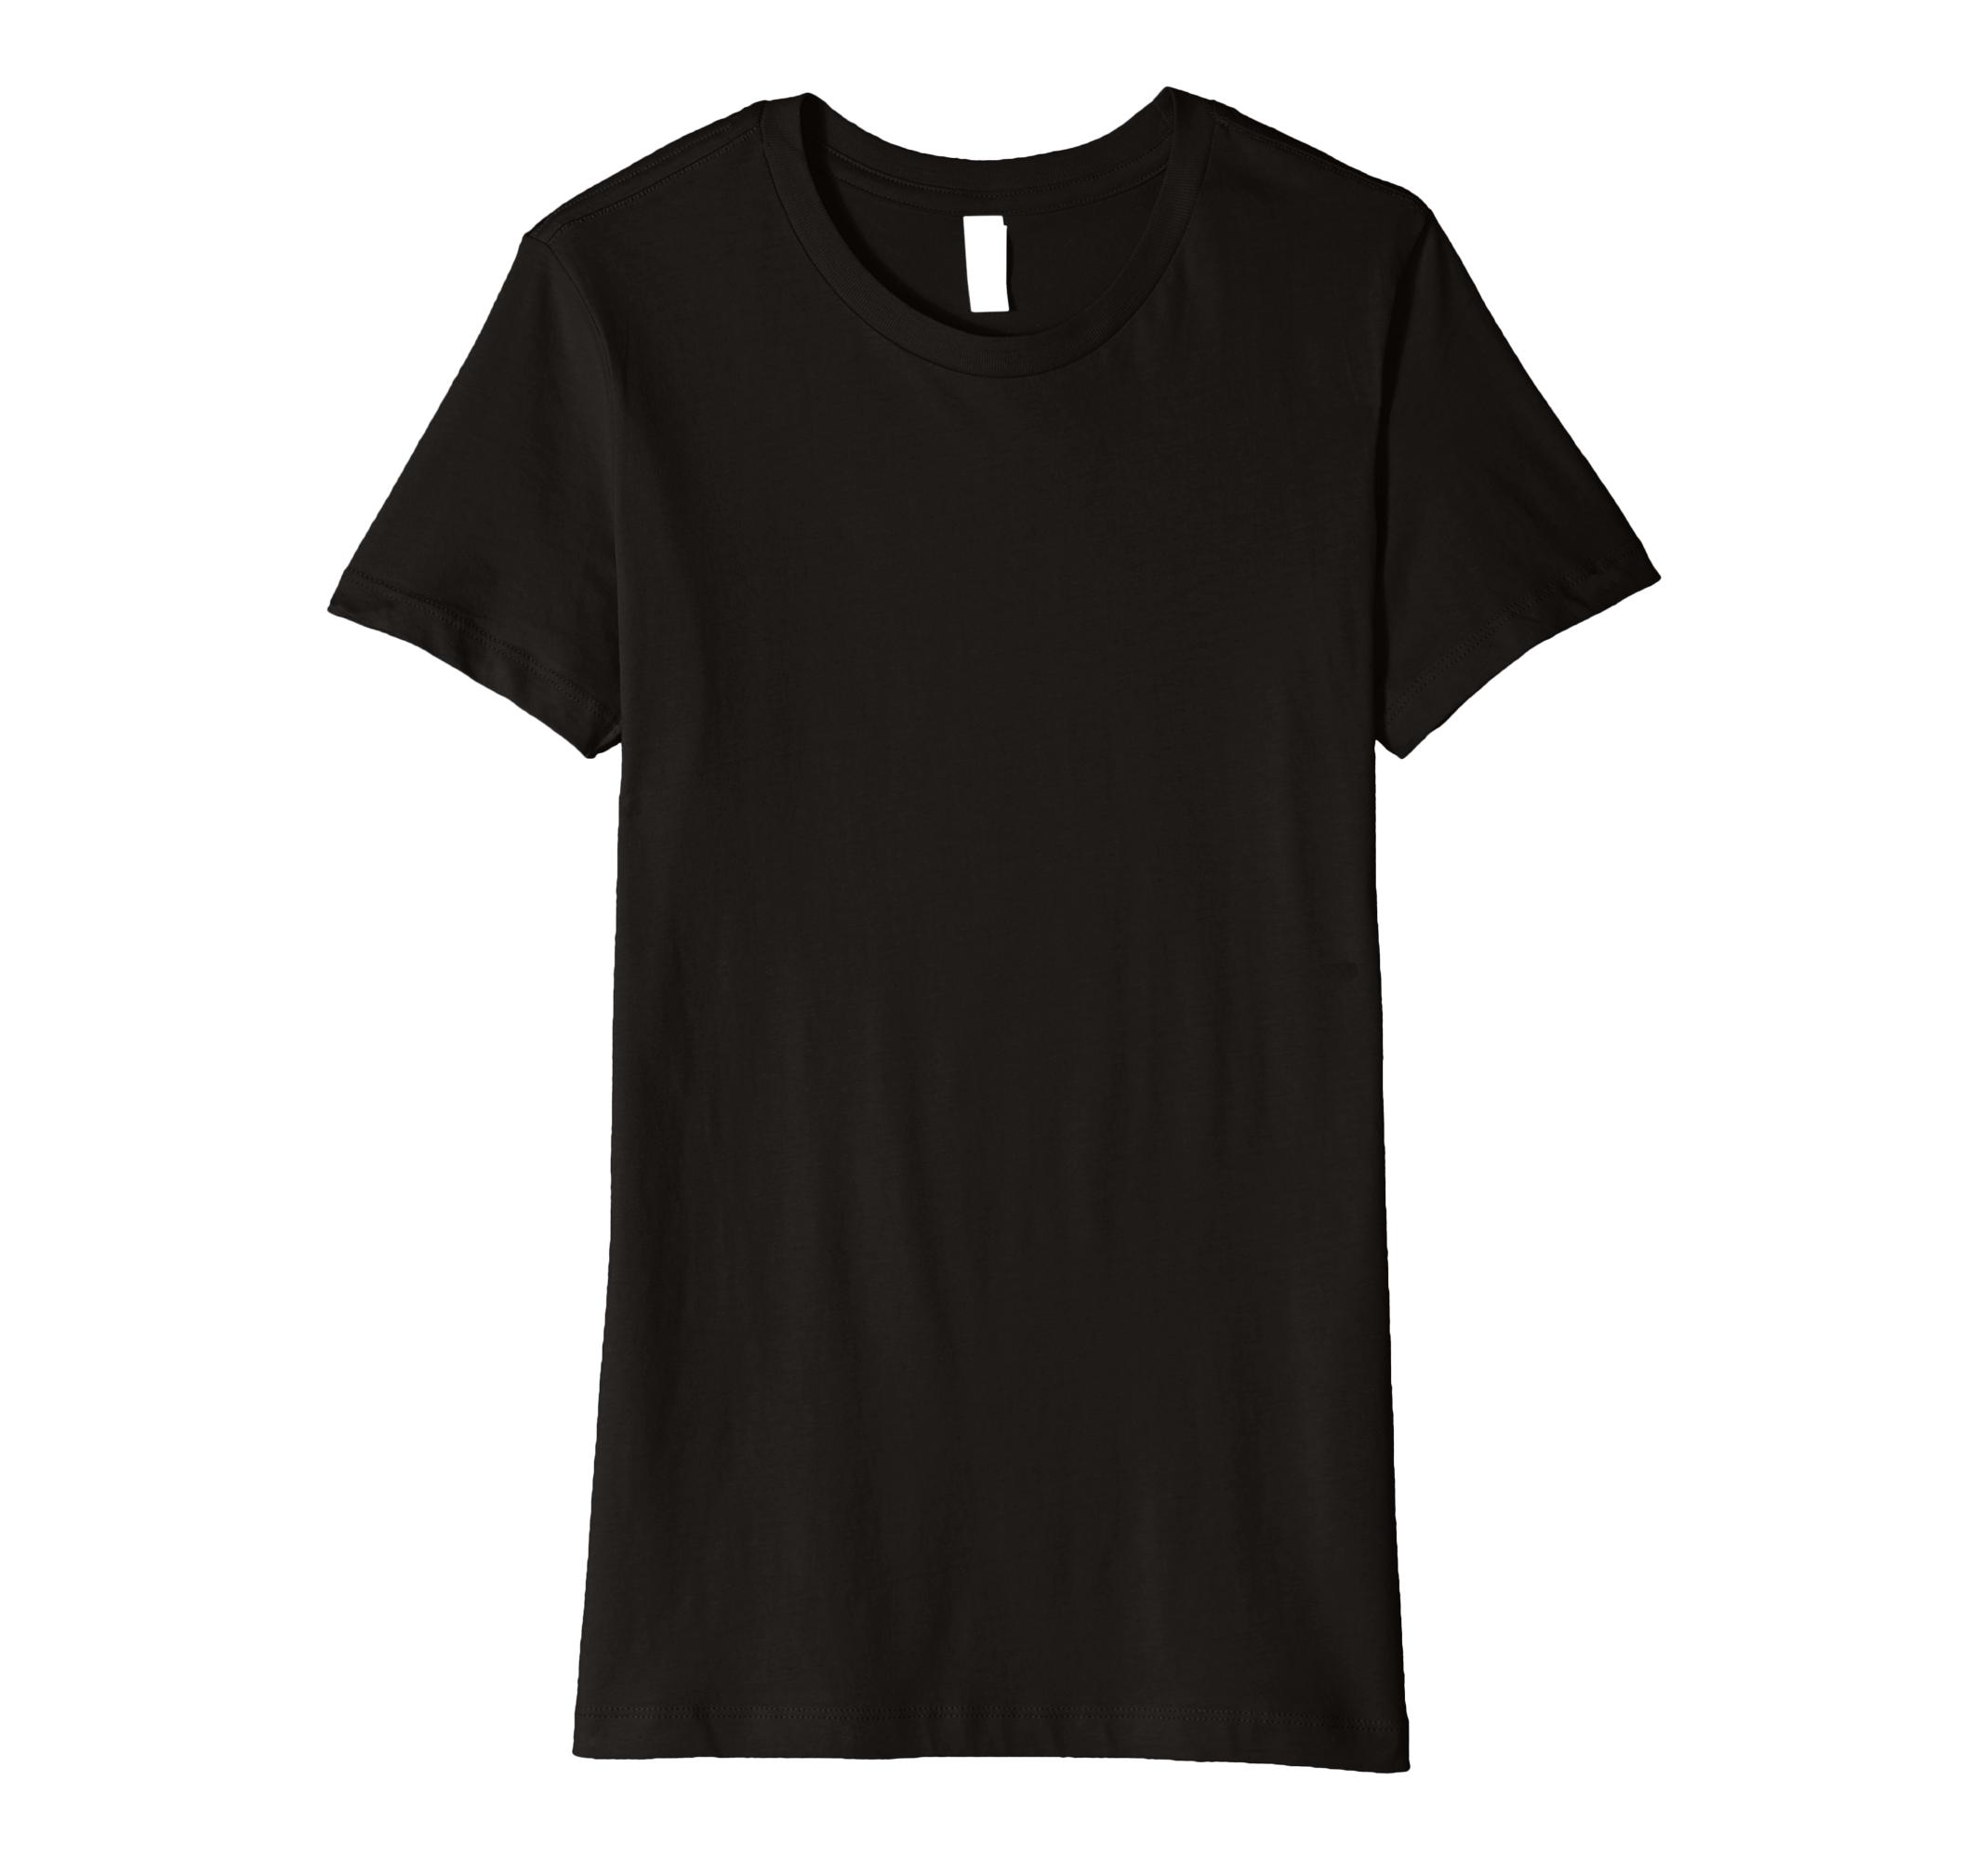 Womens Maternity Baby Skeleton Funny Print Tee Shirt Top 085c Zeta Ville